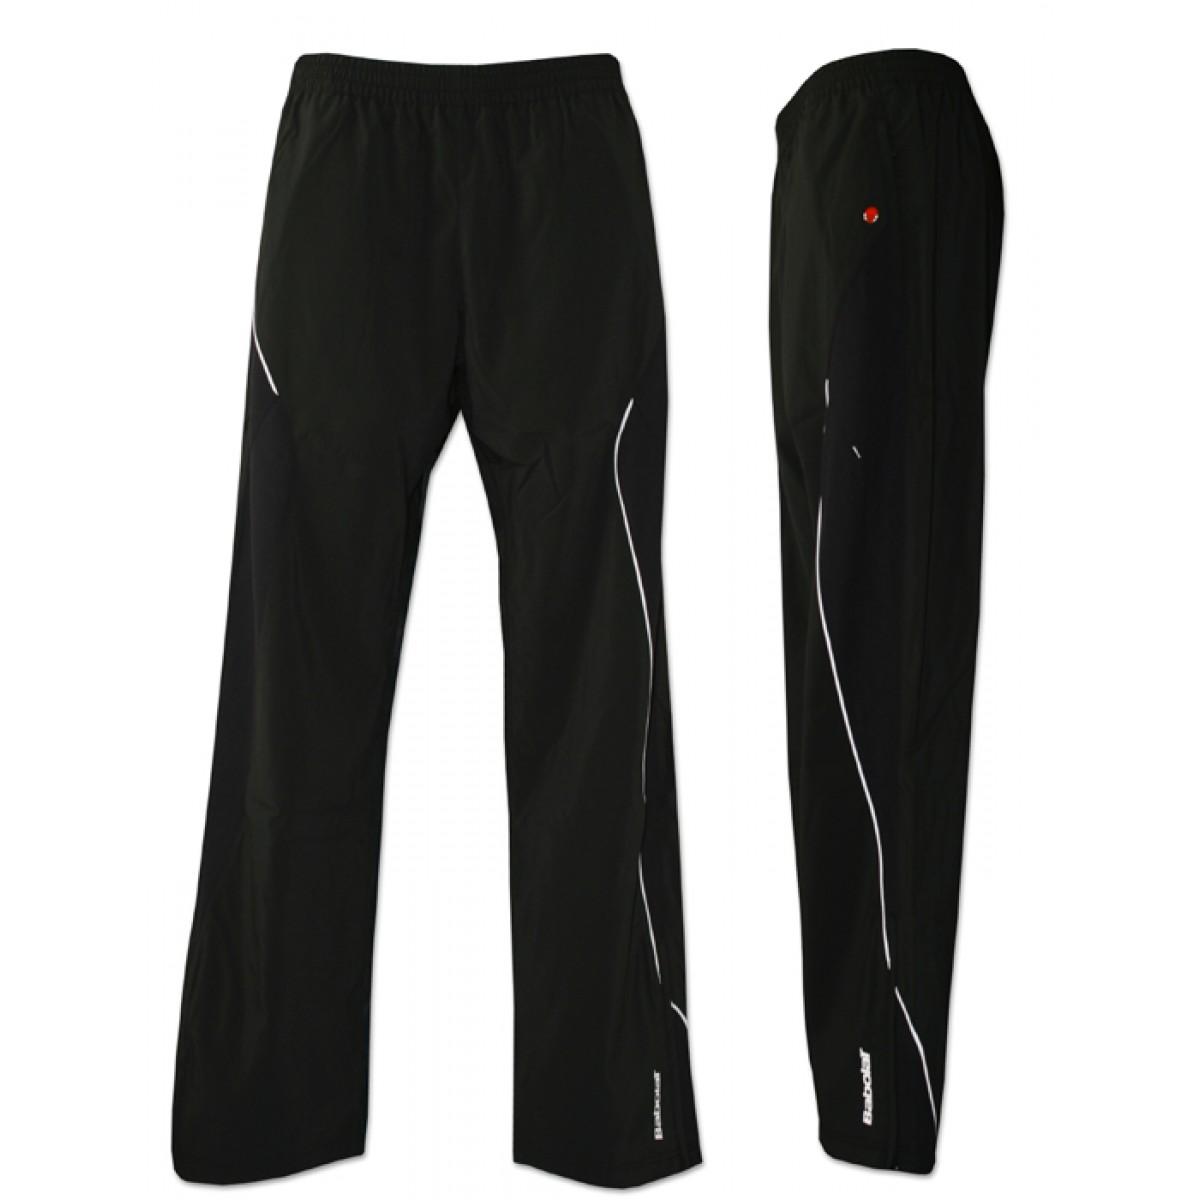 Pantalon de tennis junior fille Babolat Club 09/10